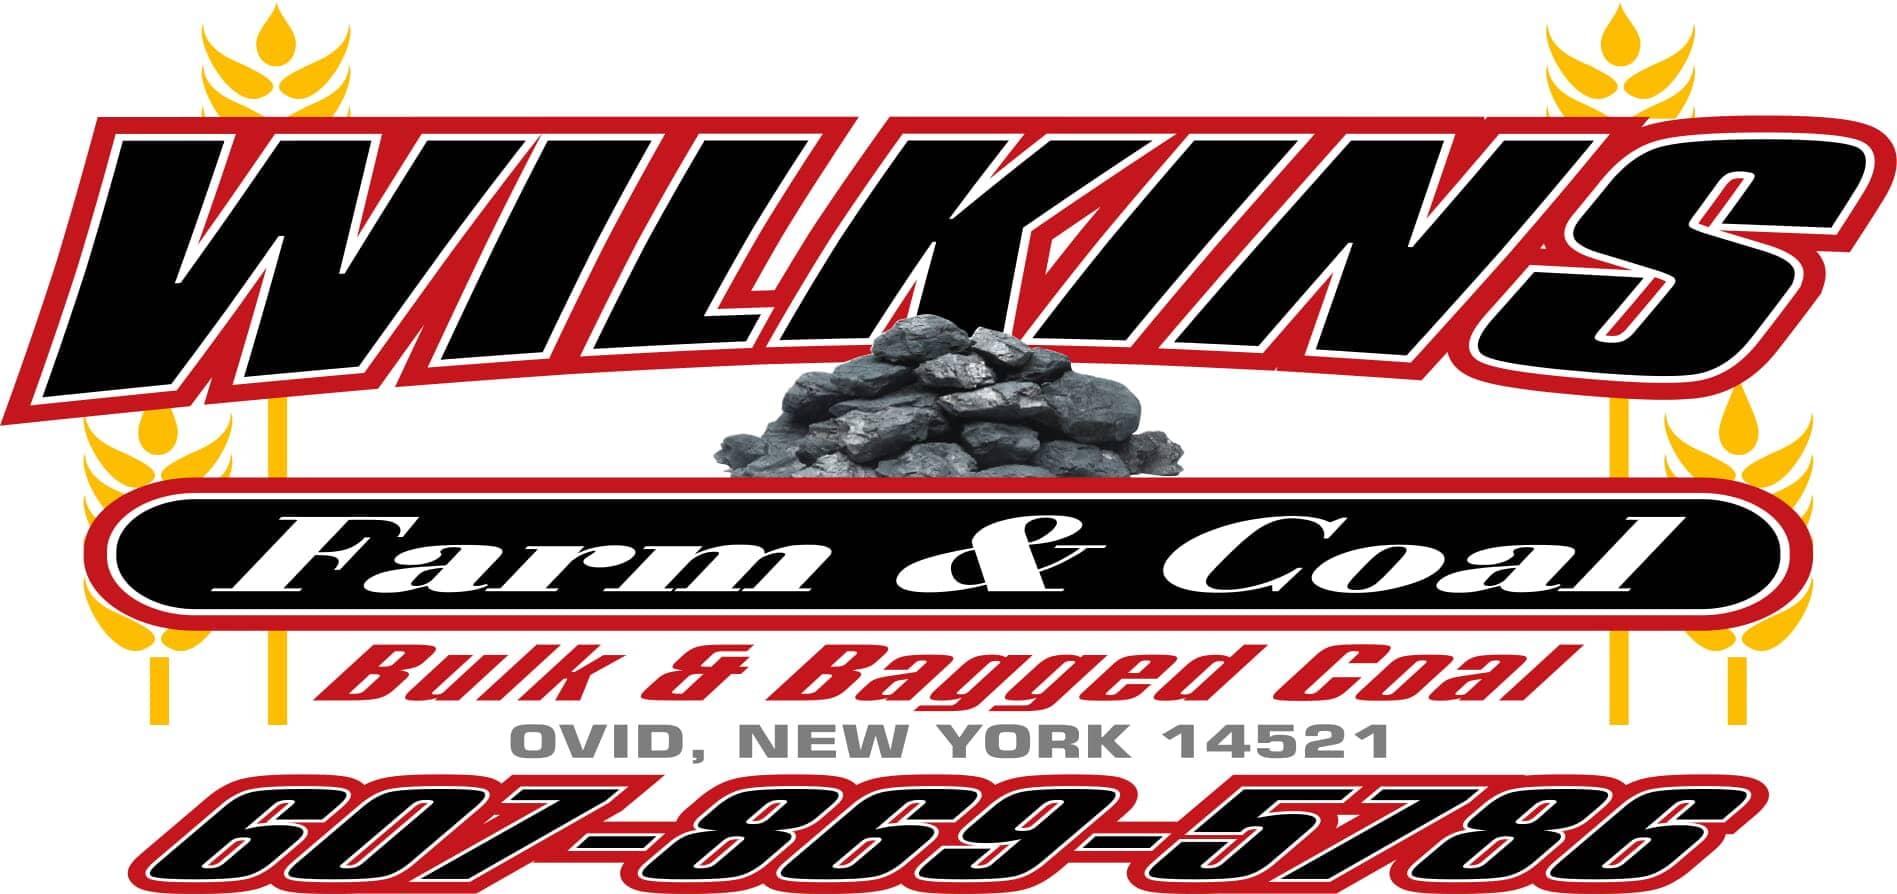 Wilkins Farm and Coal